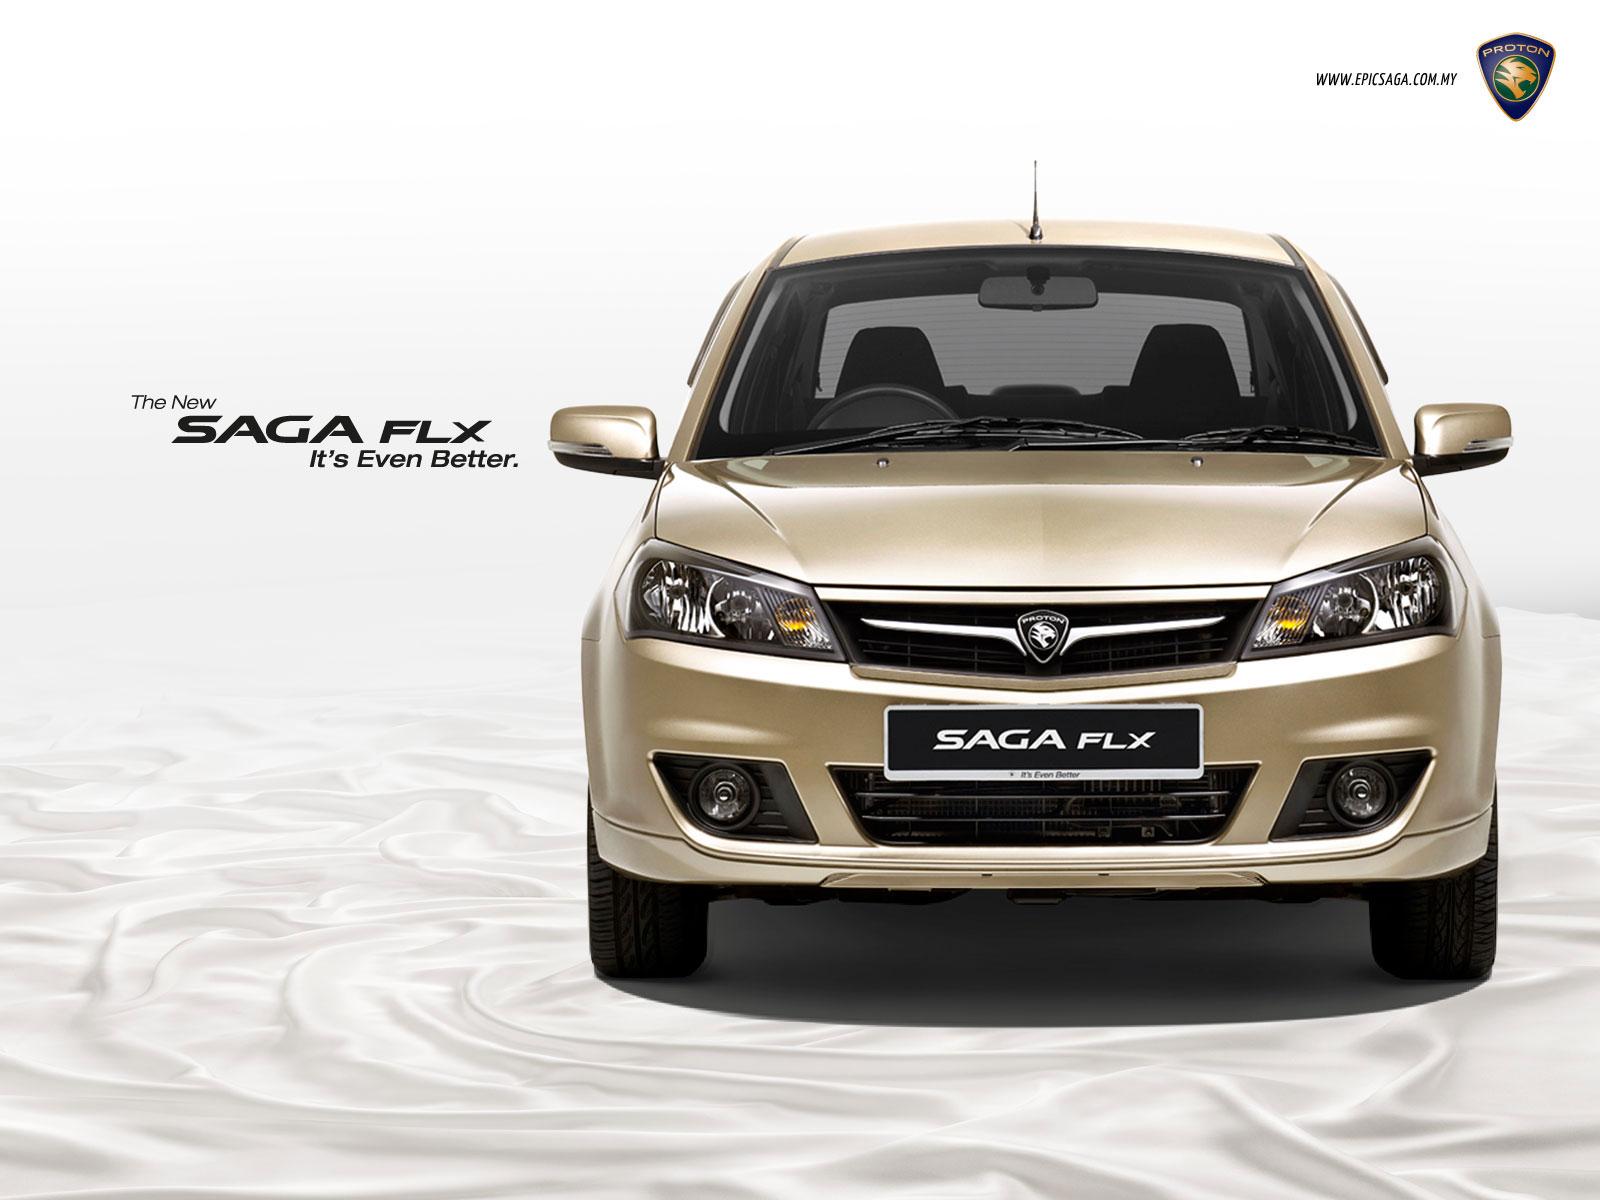 Proton Saga FLX - Promosi Hebat 2013